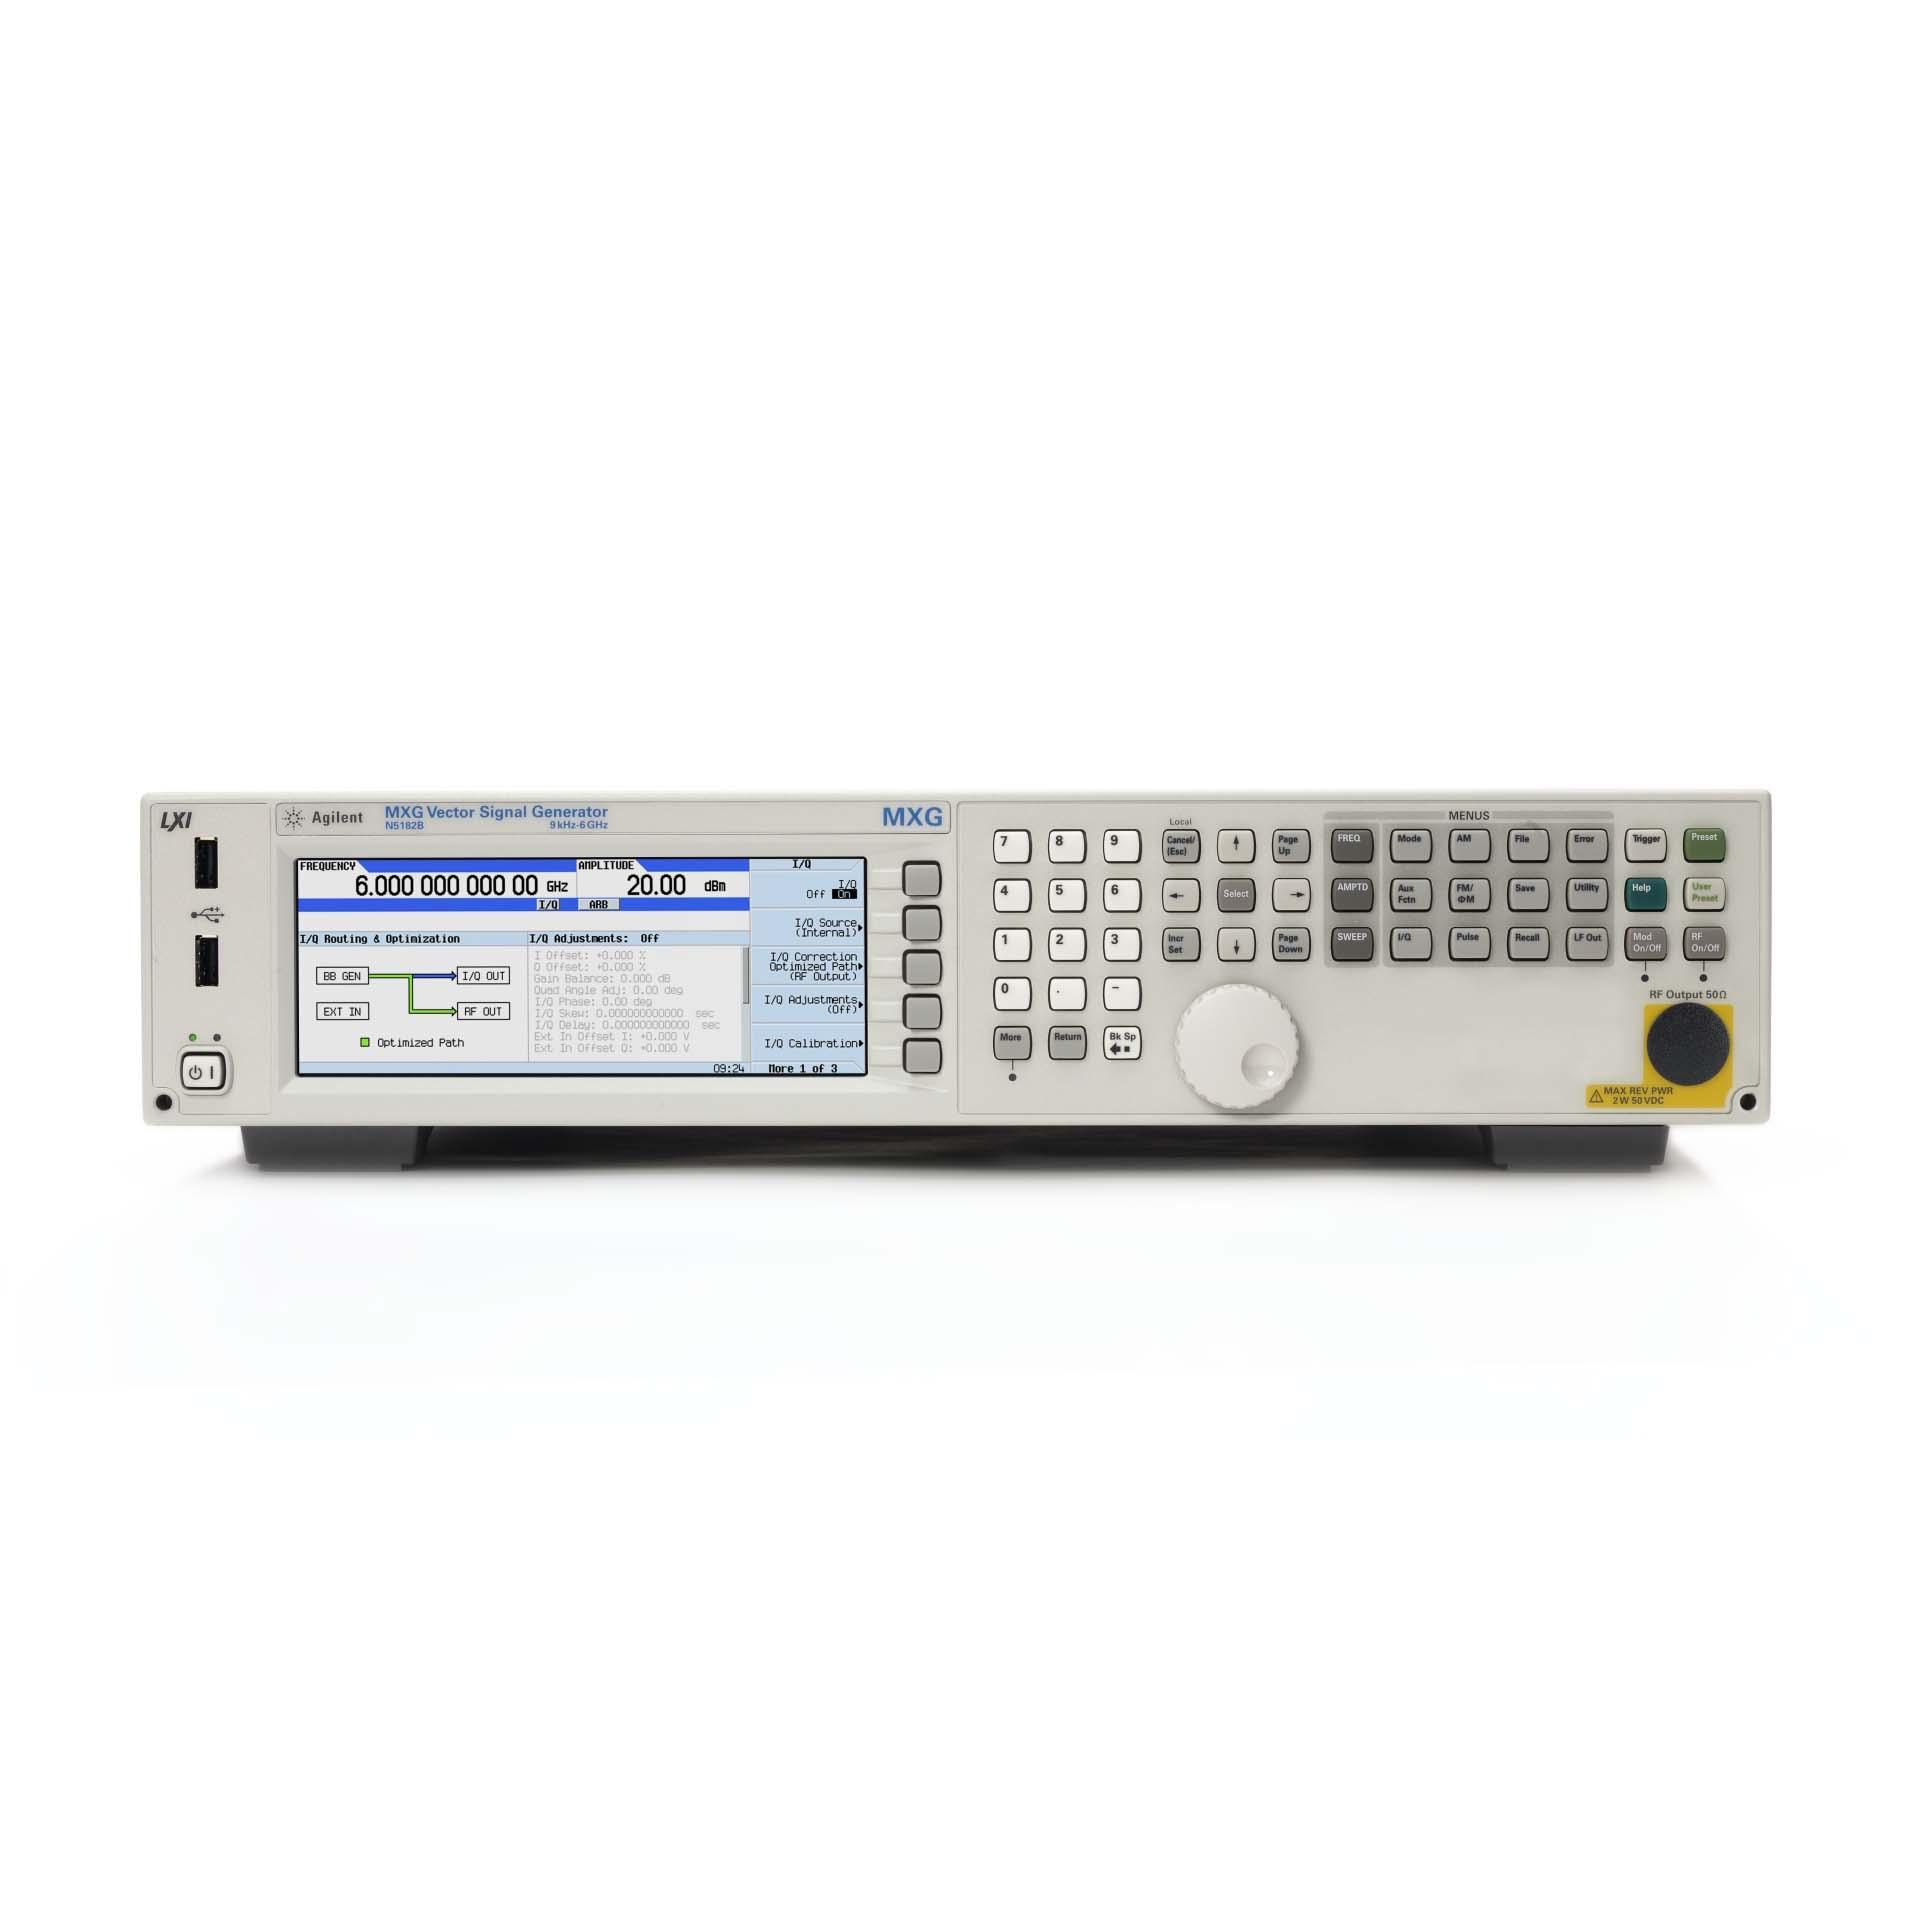 N5182B/022,1EA,1ER,403,506,656,UNV,N7601B-3FP・EFP・FFP・QFP・RFP,N7624B-3FP・HFP・JFP・SFP・TFP,N7625B-3FP・EFP・JFP・QFP・TFP RFベクトル信号発生器